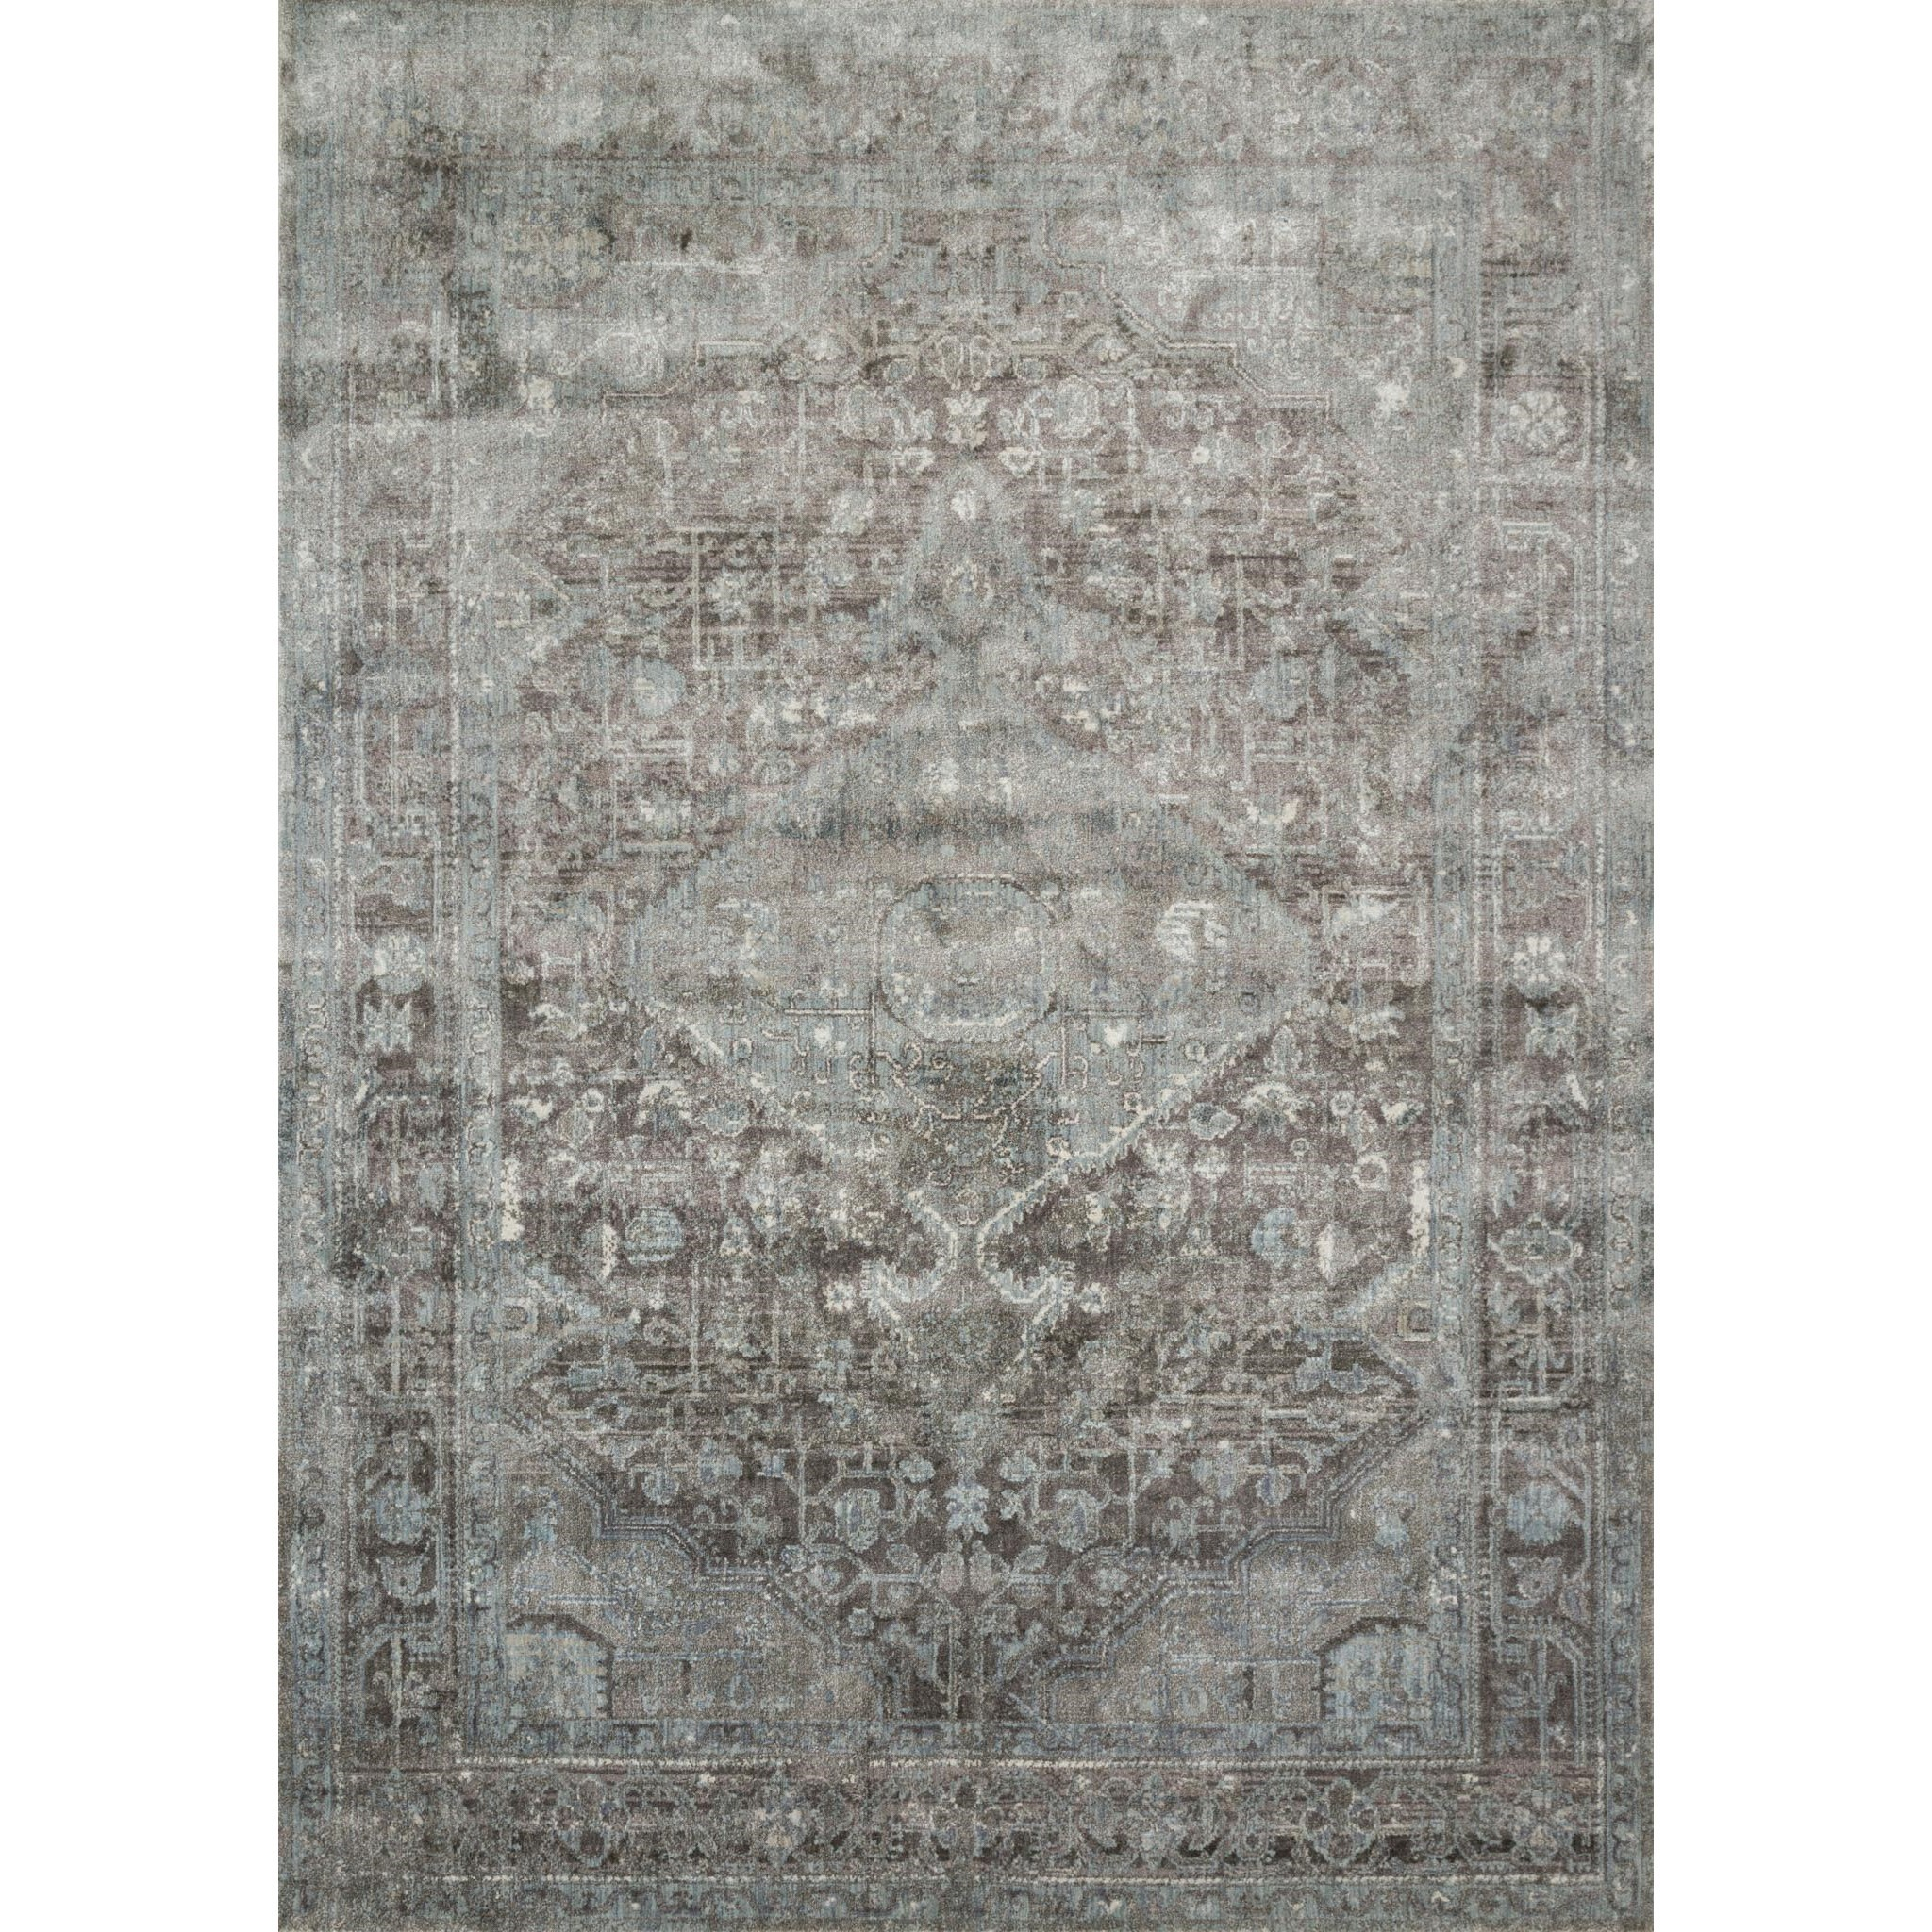 "Anastasia 9'-6"" x 13' Rug by Loloi Rugs at Sprintz Furniture"